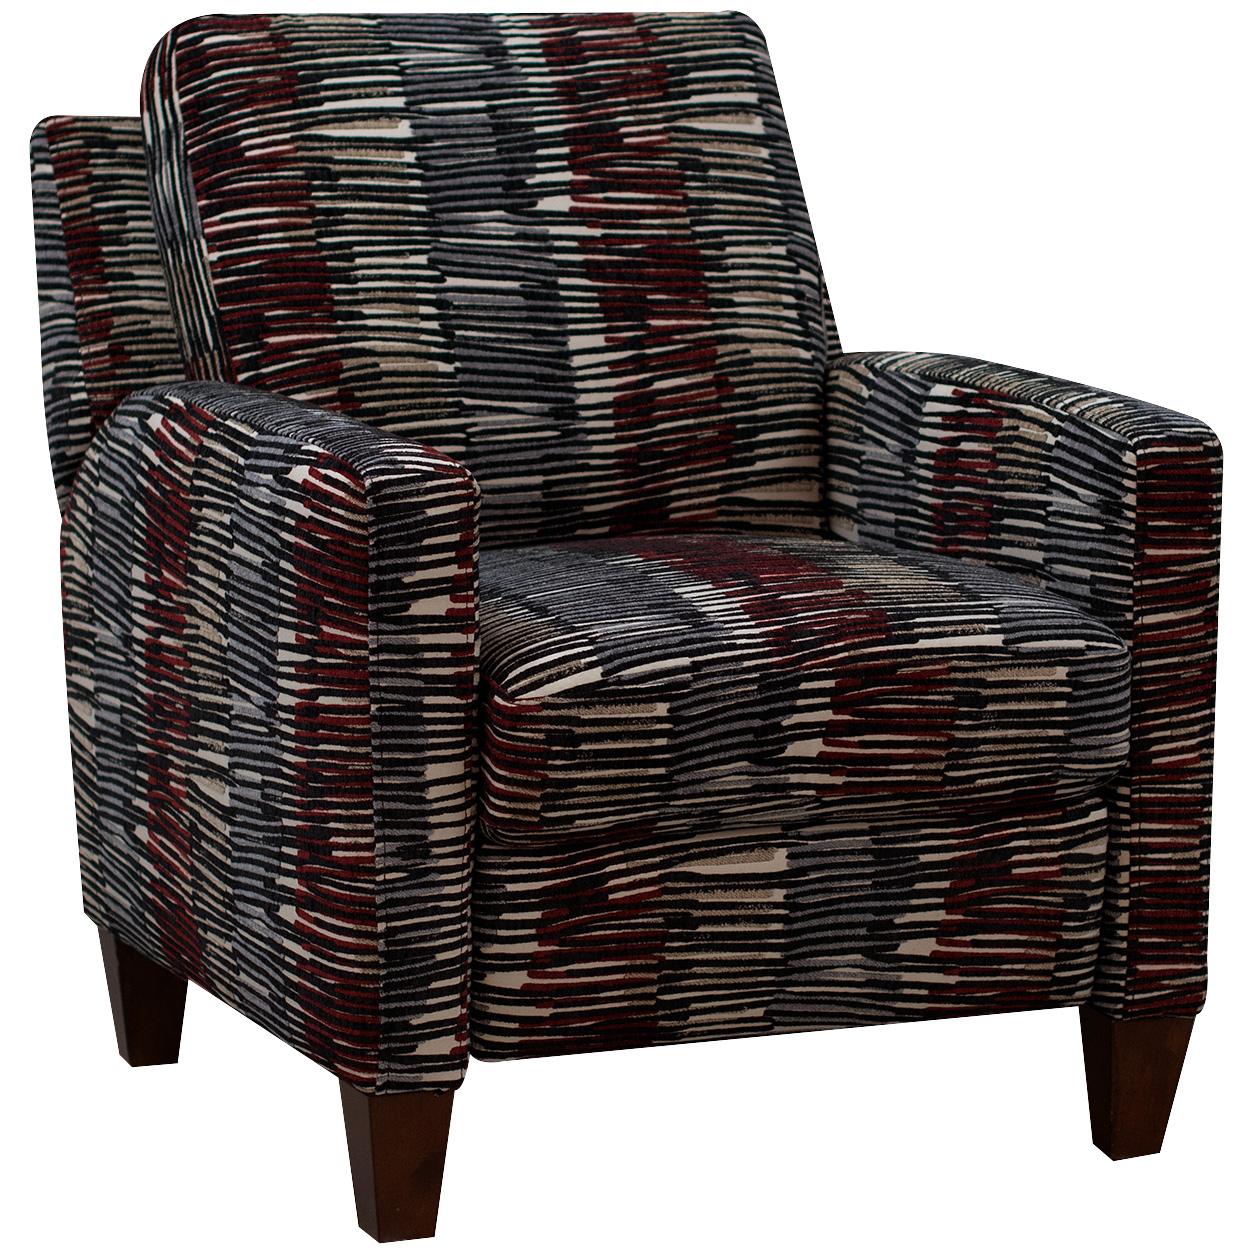 Dimensions By England   Bossa Nova Multicolored High Leg Recliner Chair